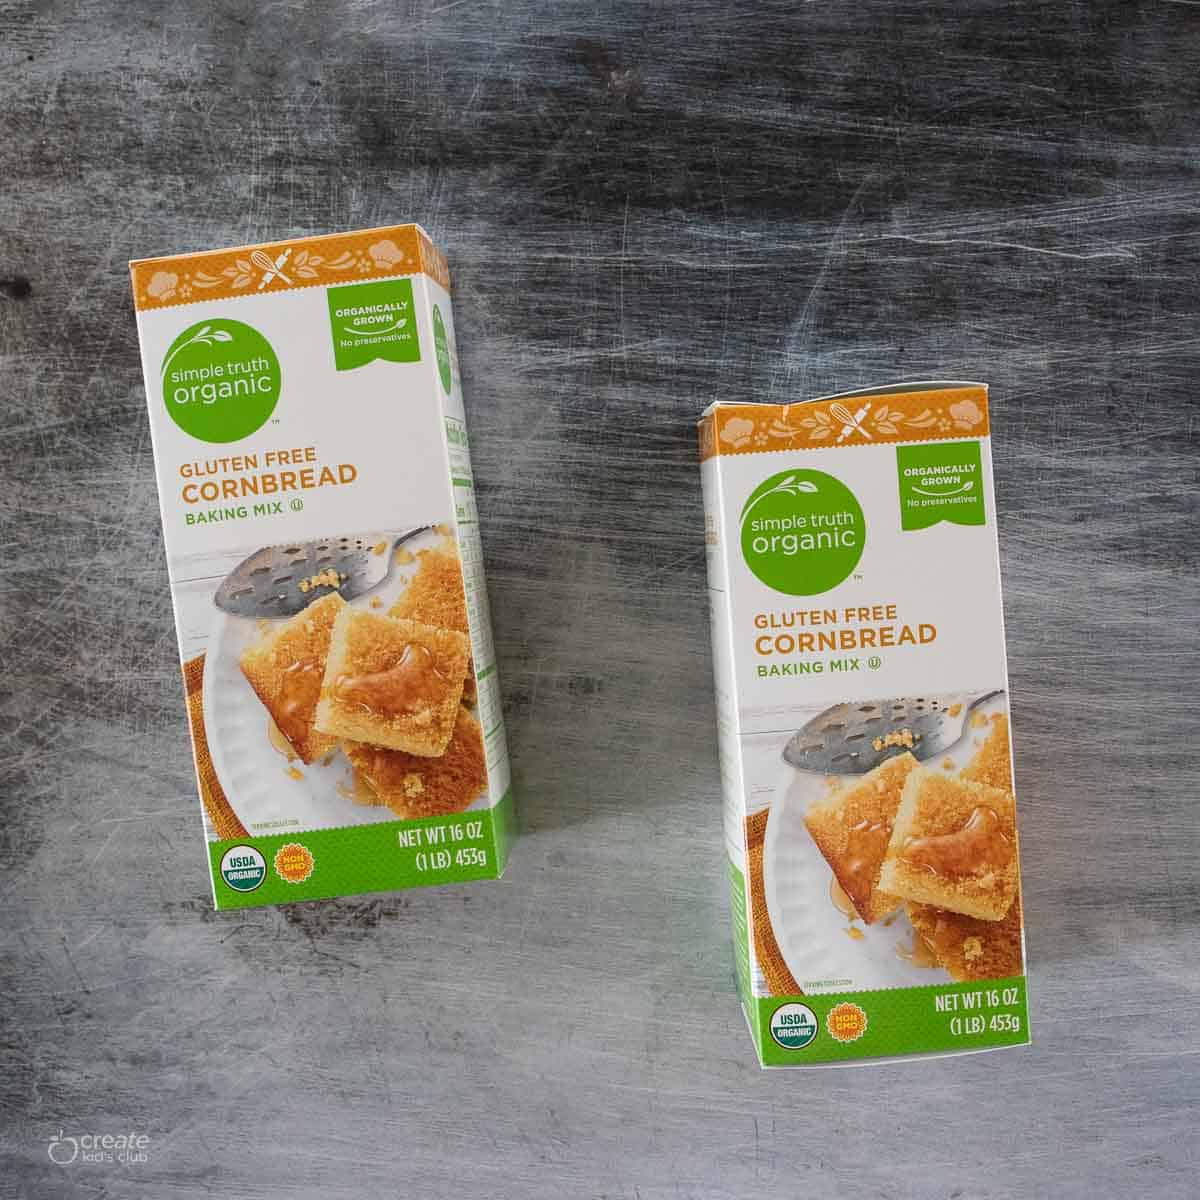 cartons of gluten free cornbread baking mix